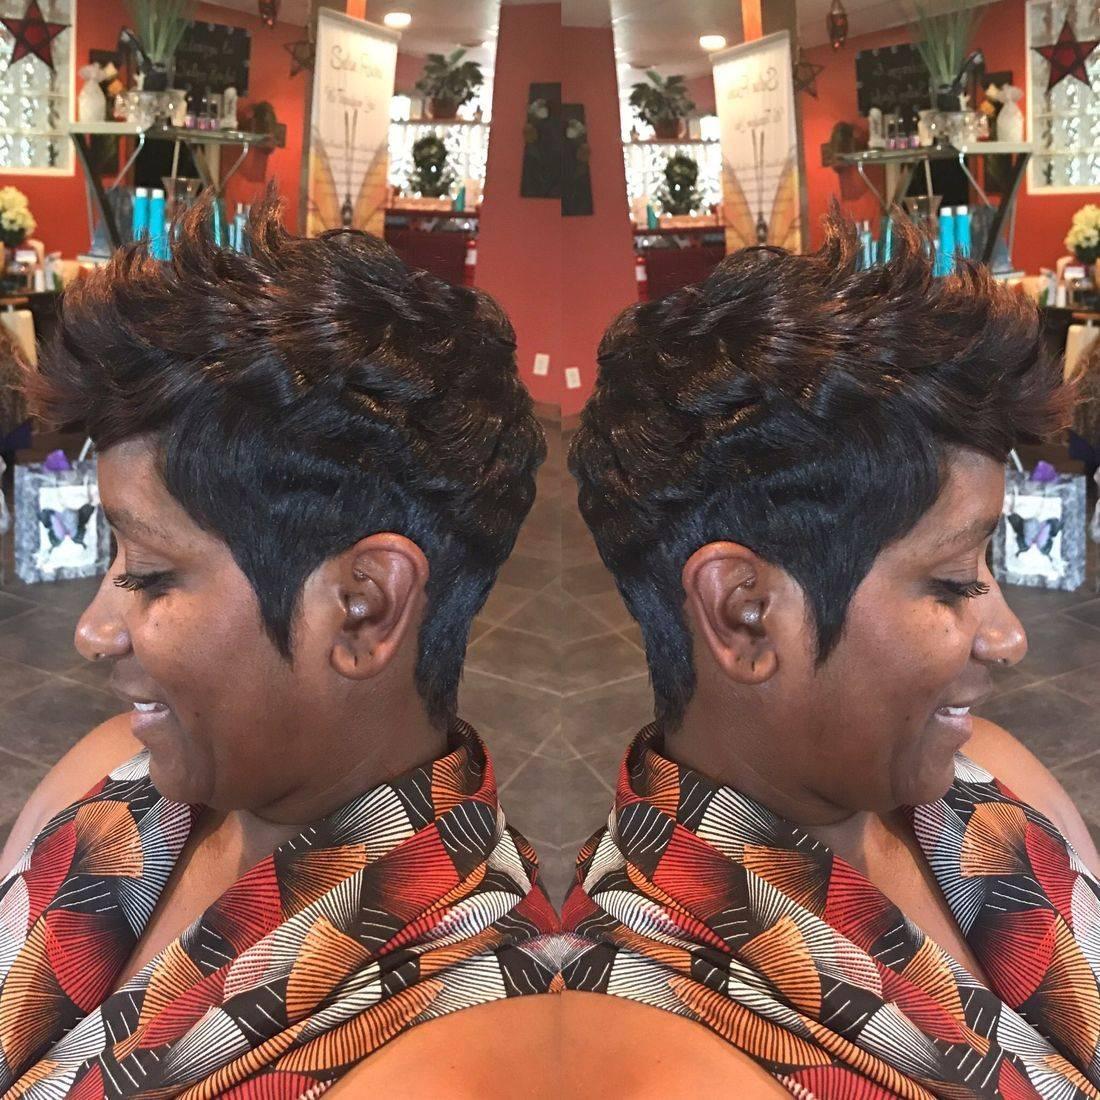 Edgy Haircut